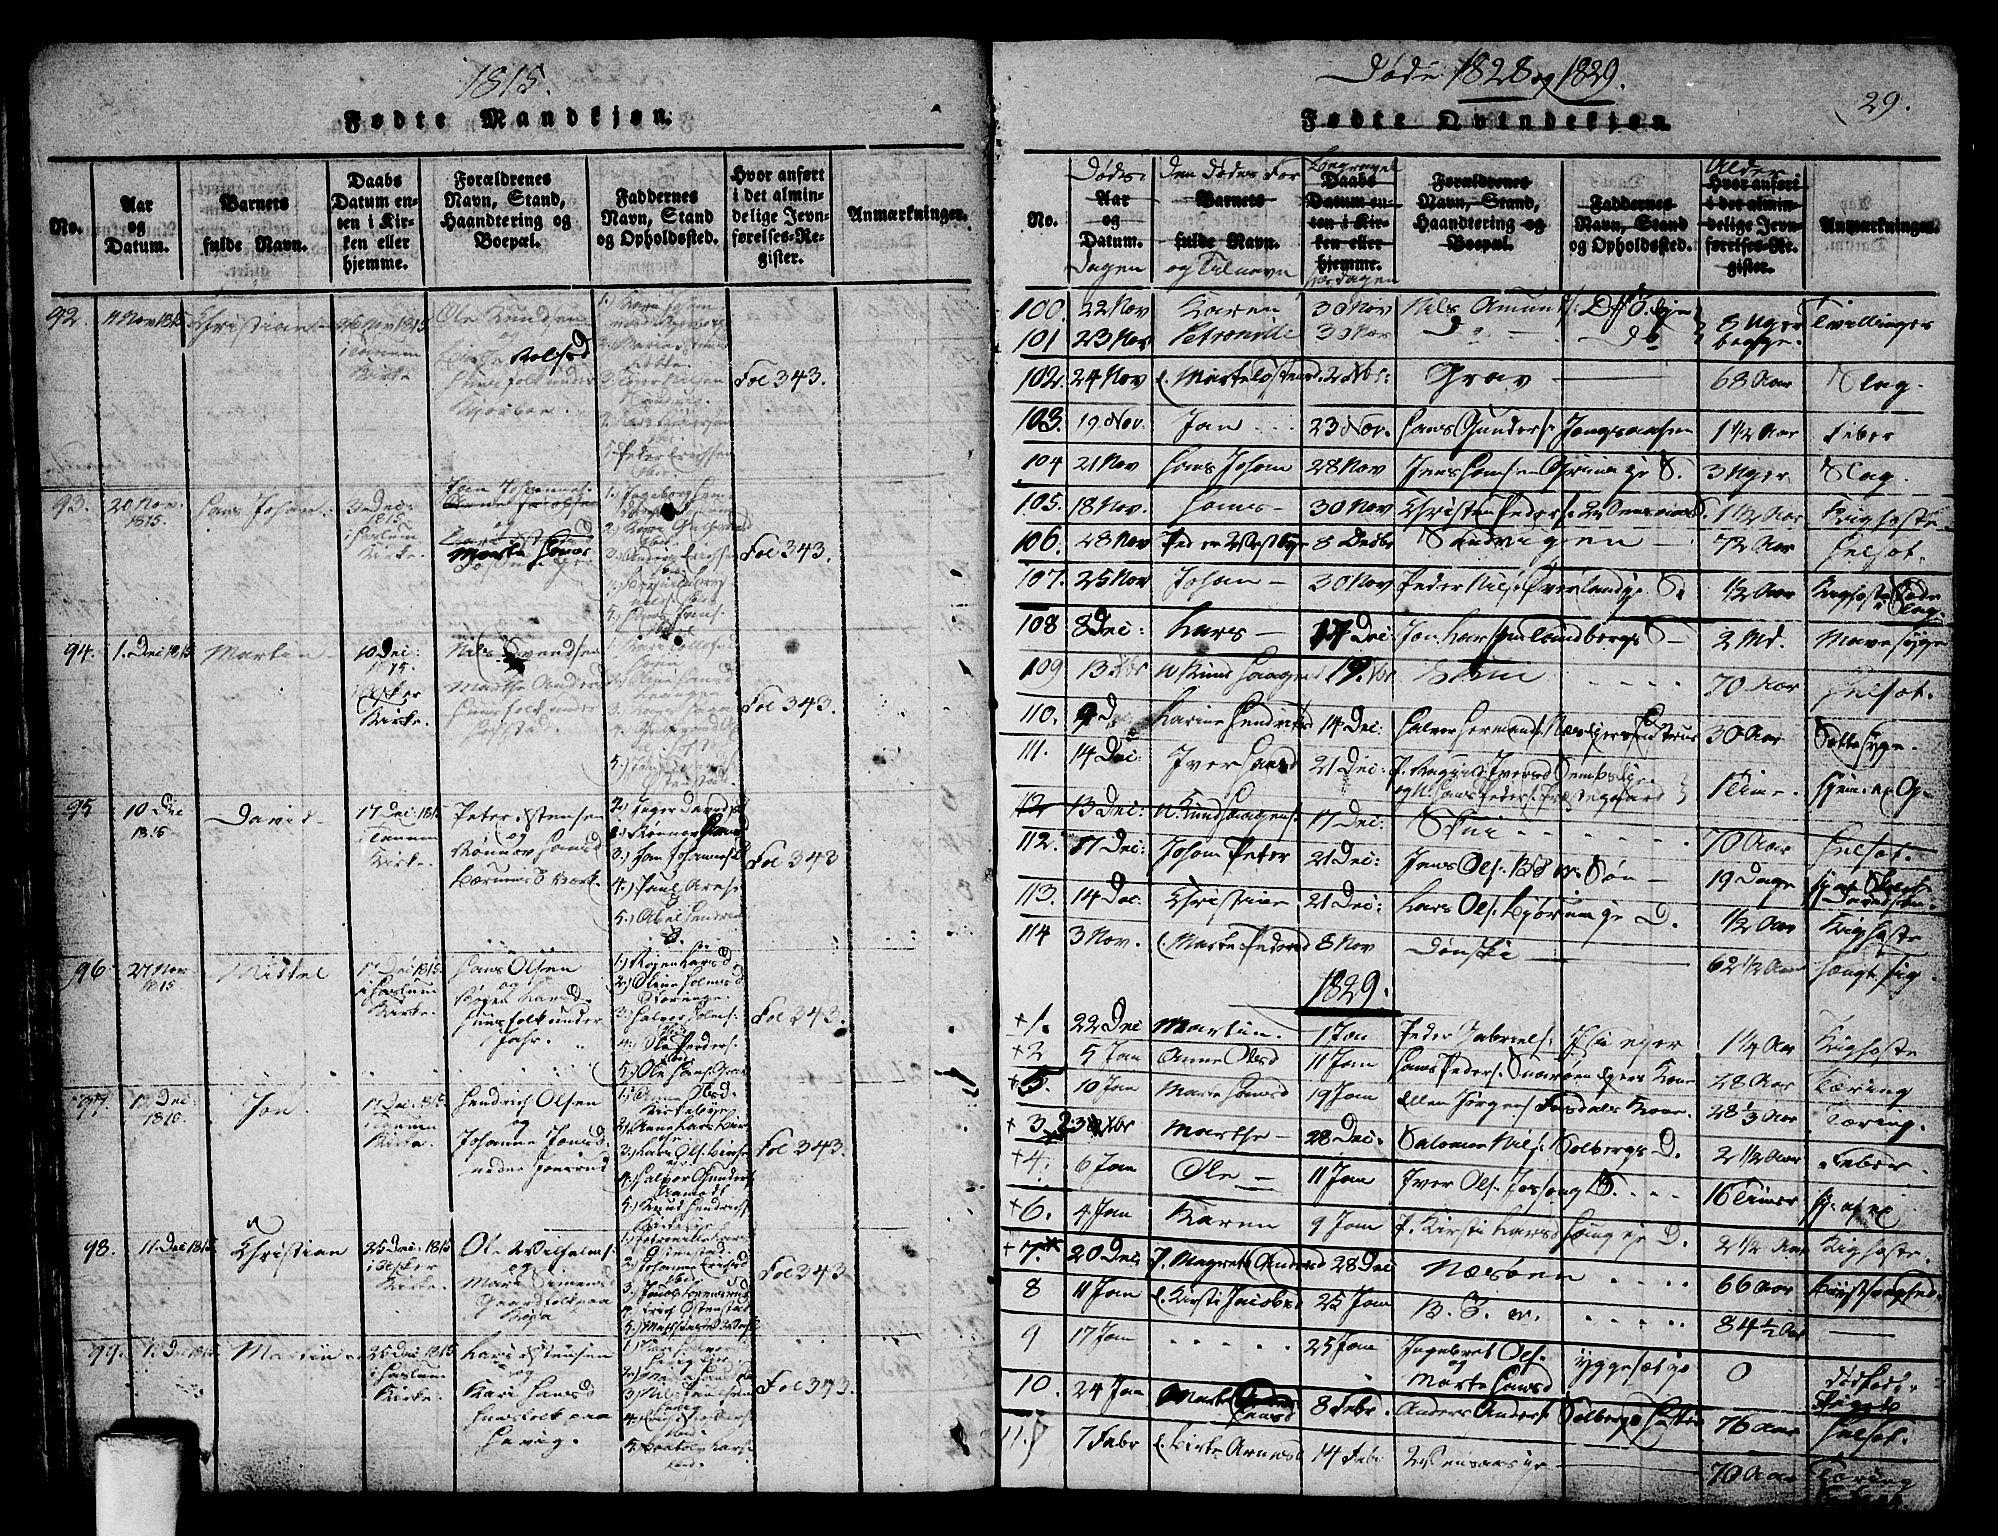 SAO, Asker prestekontor Kirkebøker, G/Ga/L0001: Klokkerbok nr. I 1, 1814-1830, s. 29